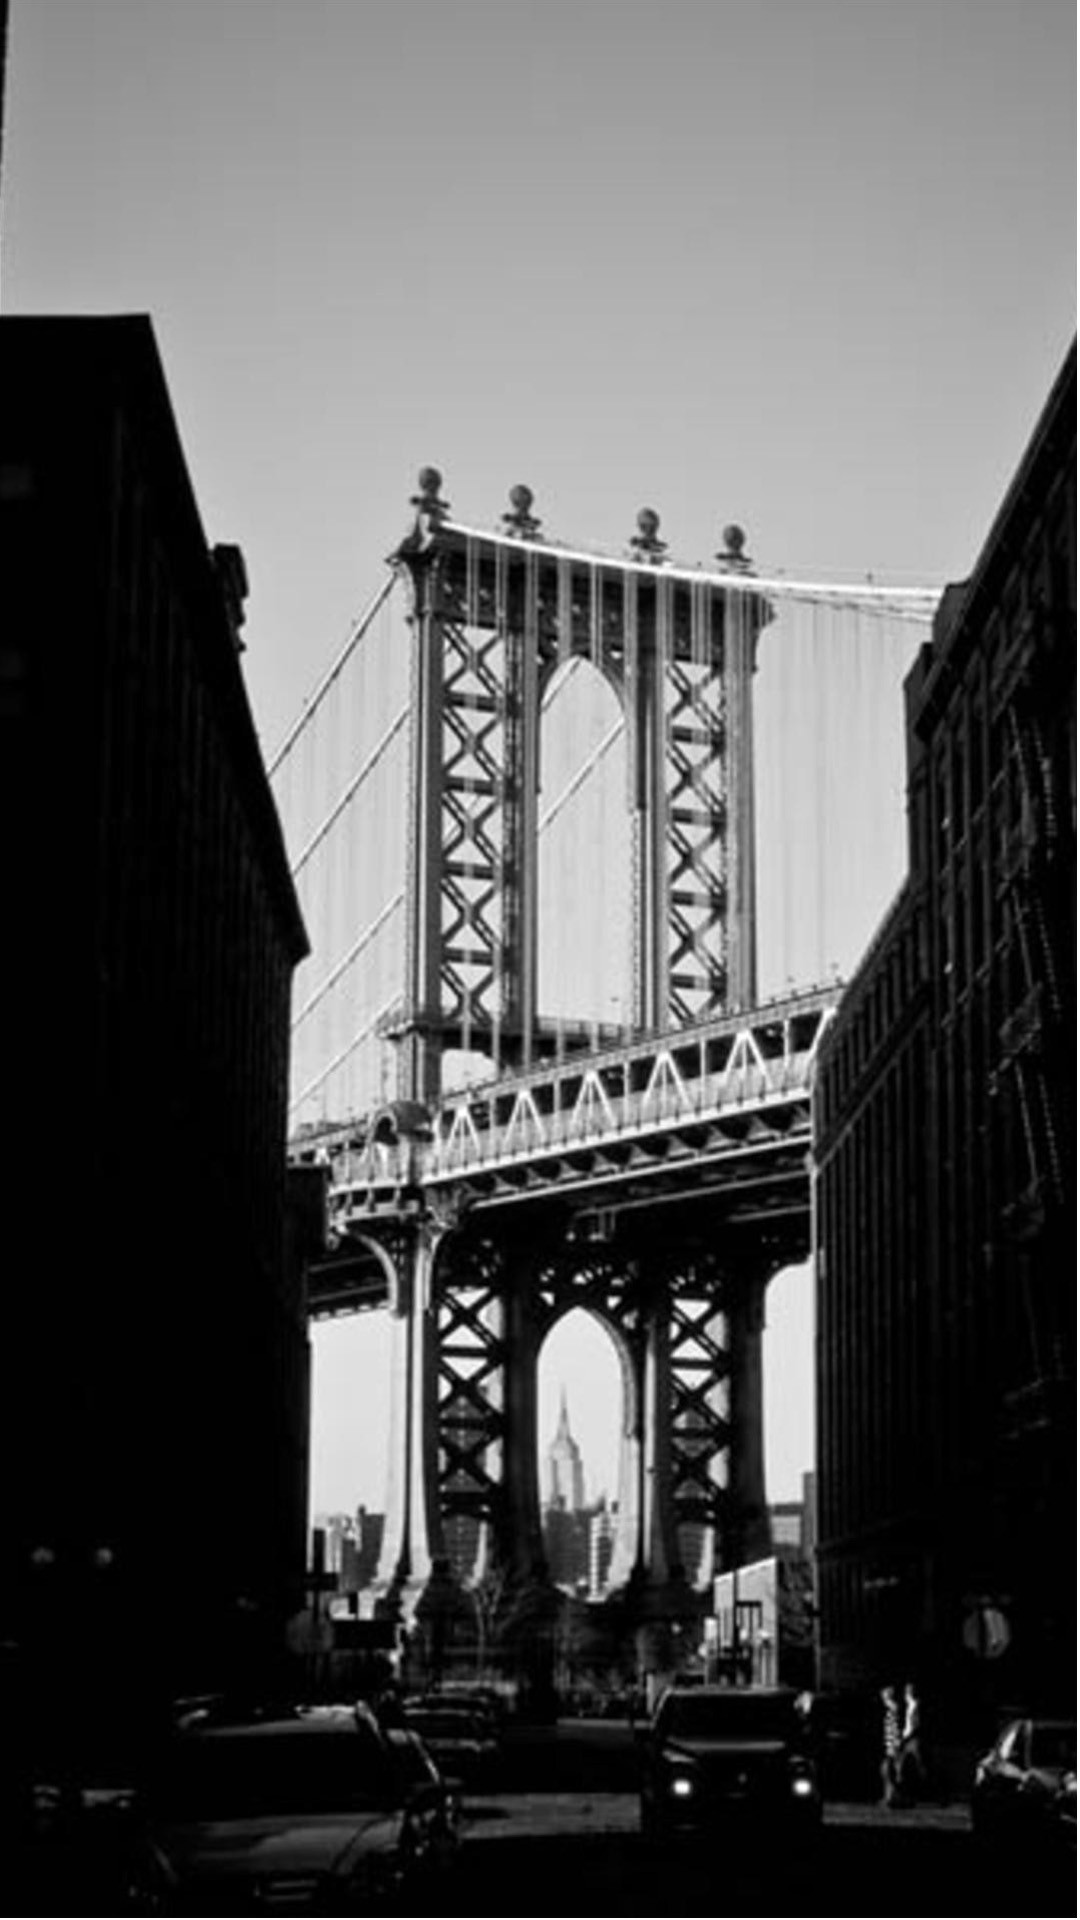 Manhattan Bridge New York Black And White iPhone 6 Plus HD .